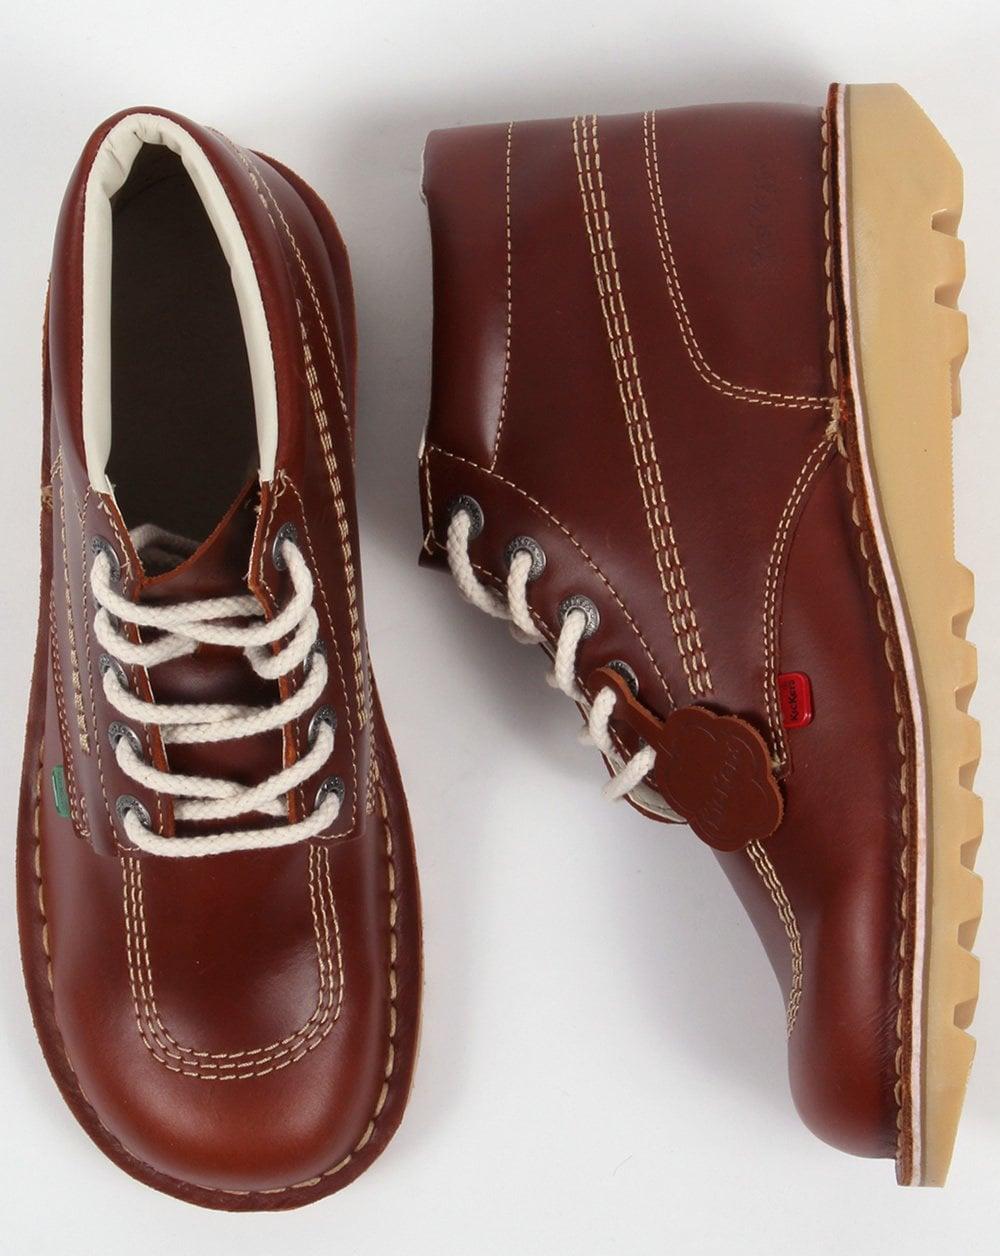 b236fcfe Kickers Kick Hi Boots In Leather Brown Dark Tan   80s casual classics